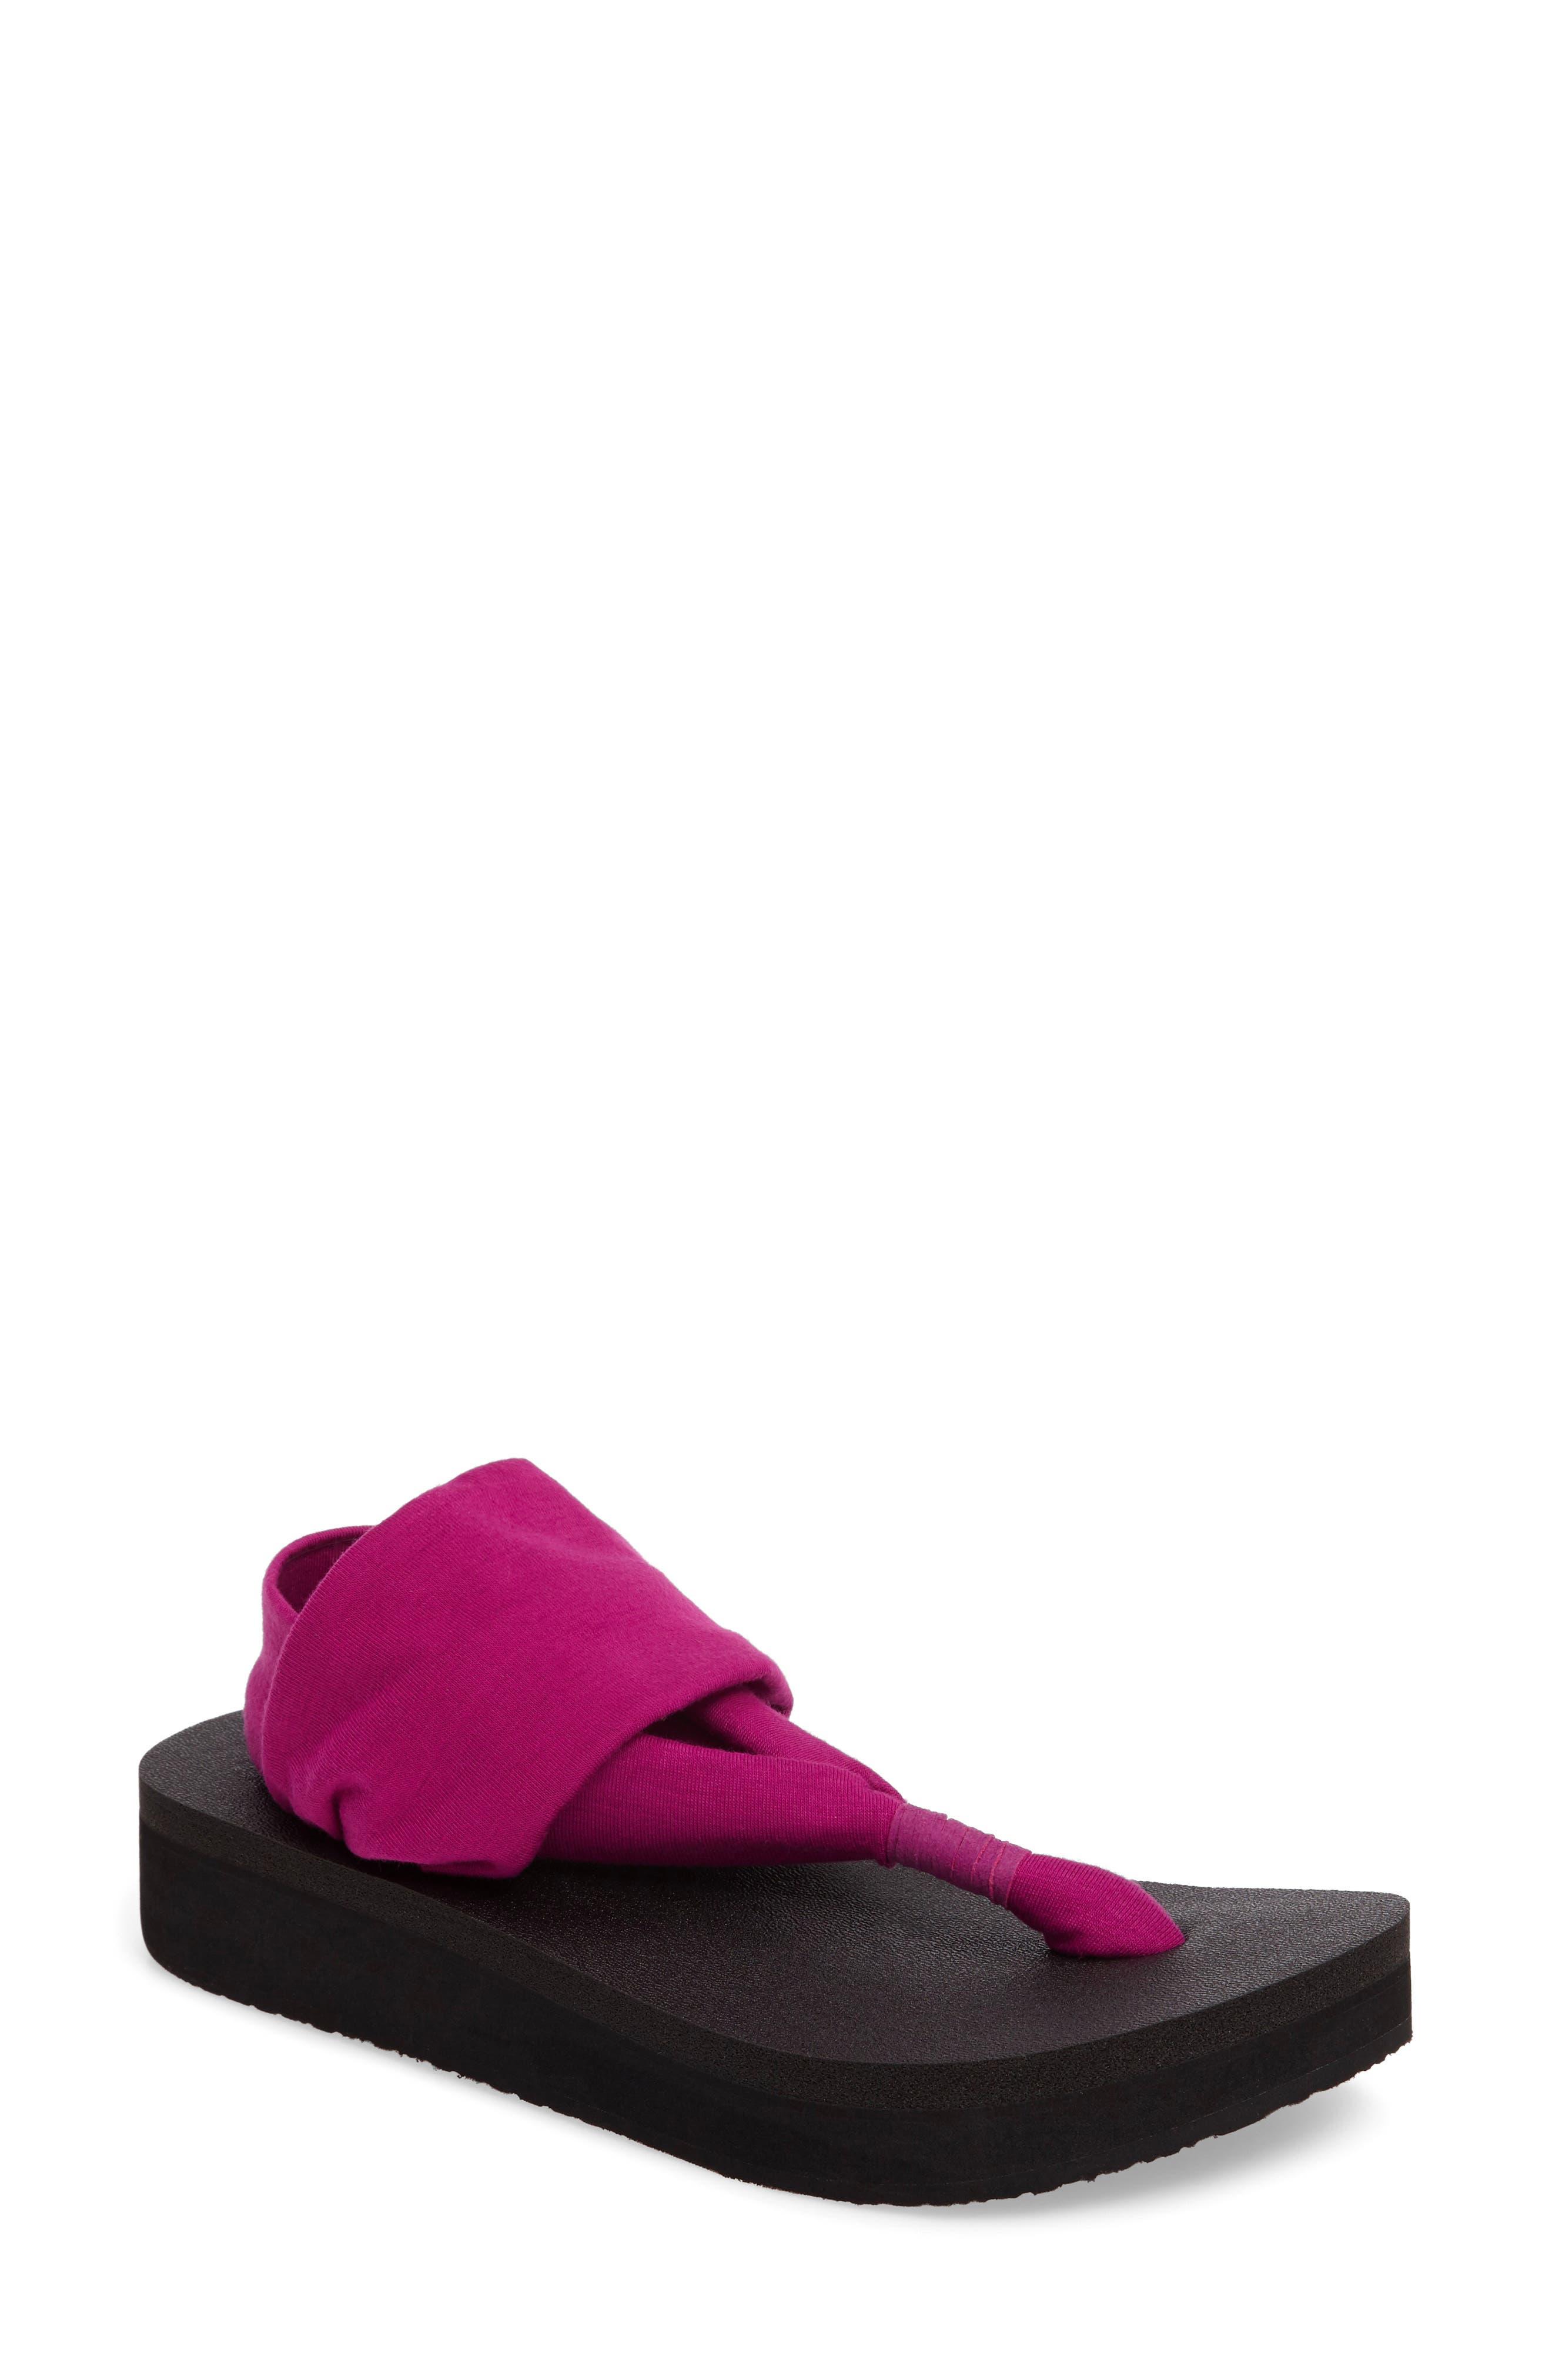 Sanuk Yoga Sling Platform Sandal (Women)